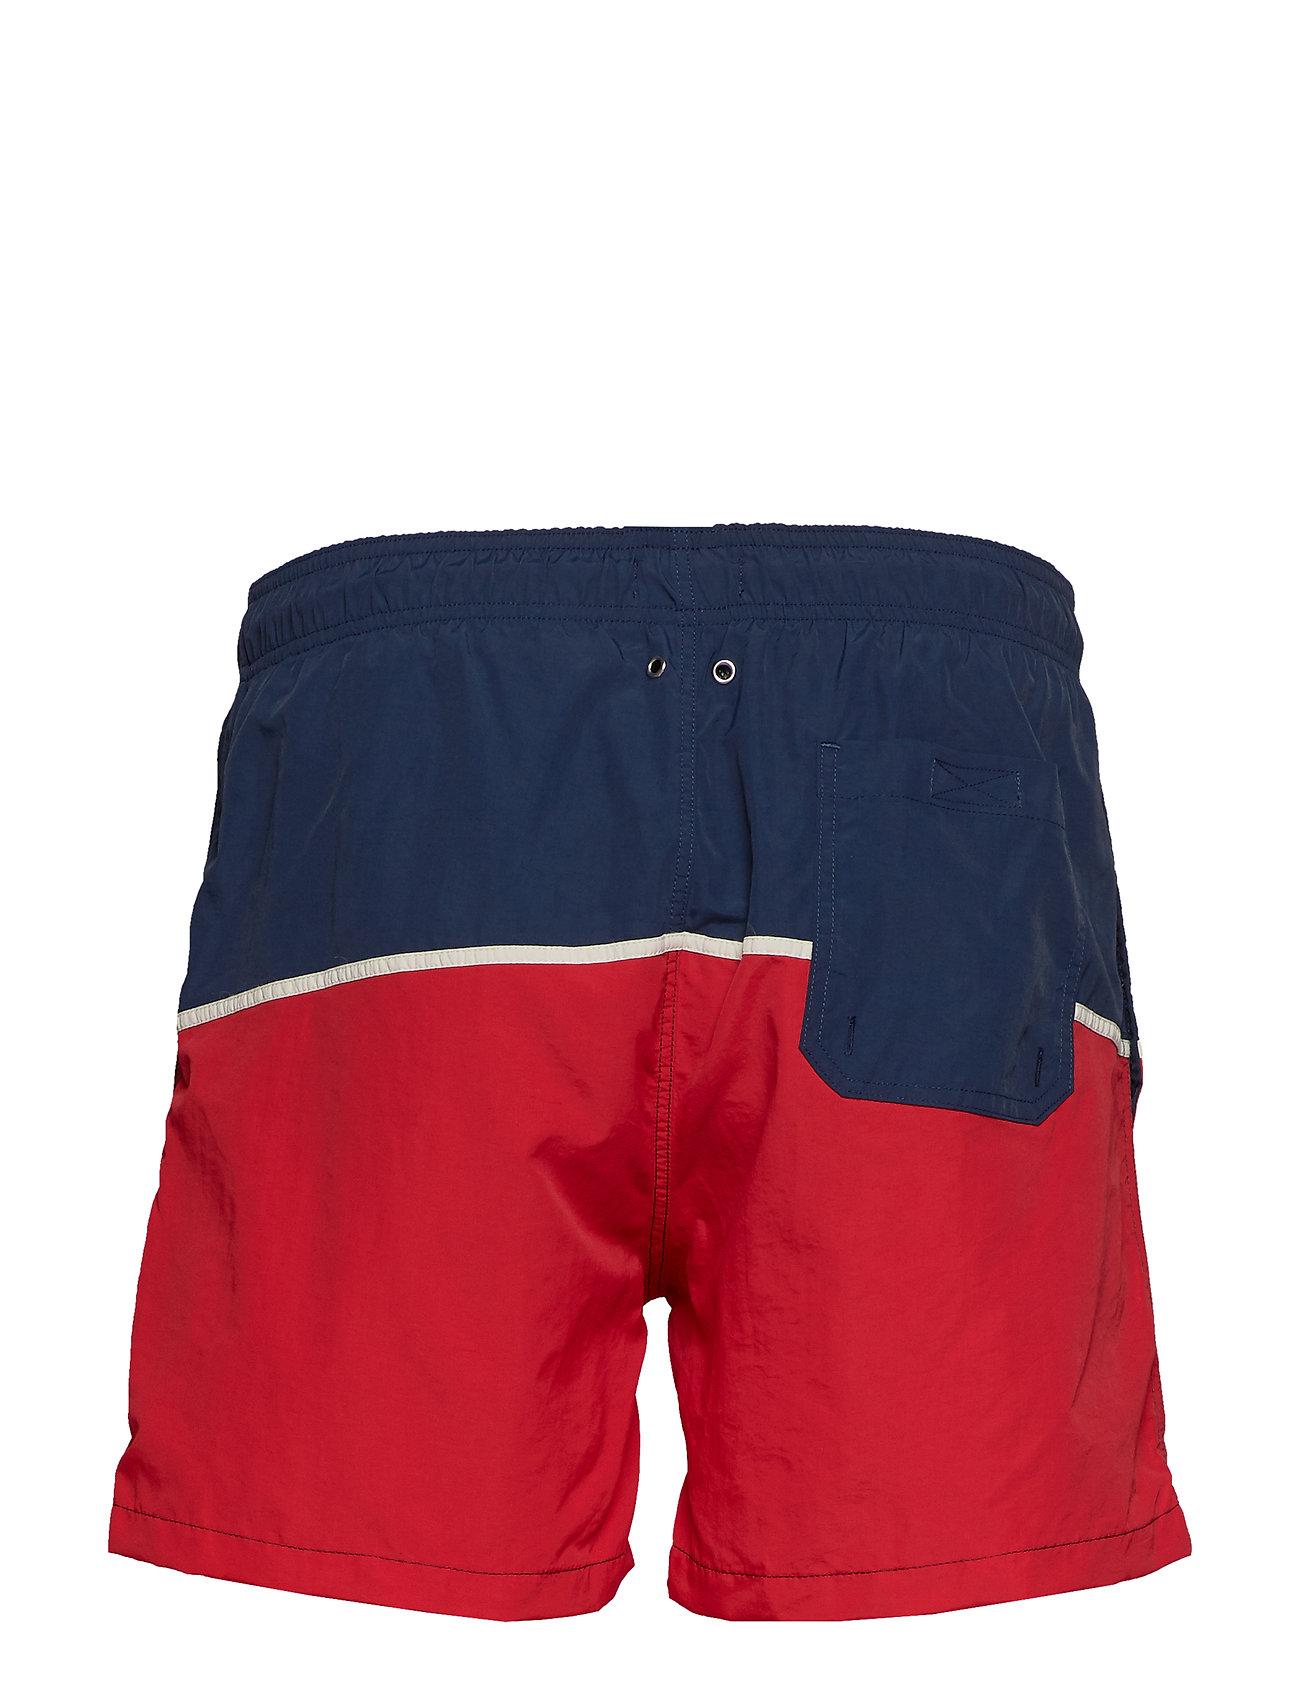 Großhändler cae54 55264 Cut And Sewn Swim Shorts C.F Badeshorts Blå GANT